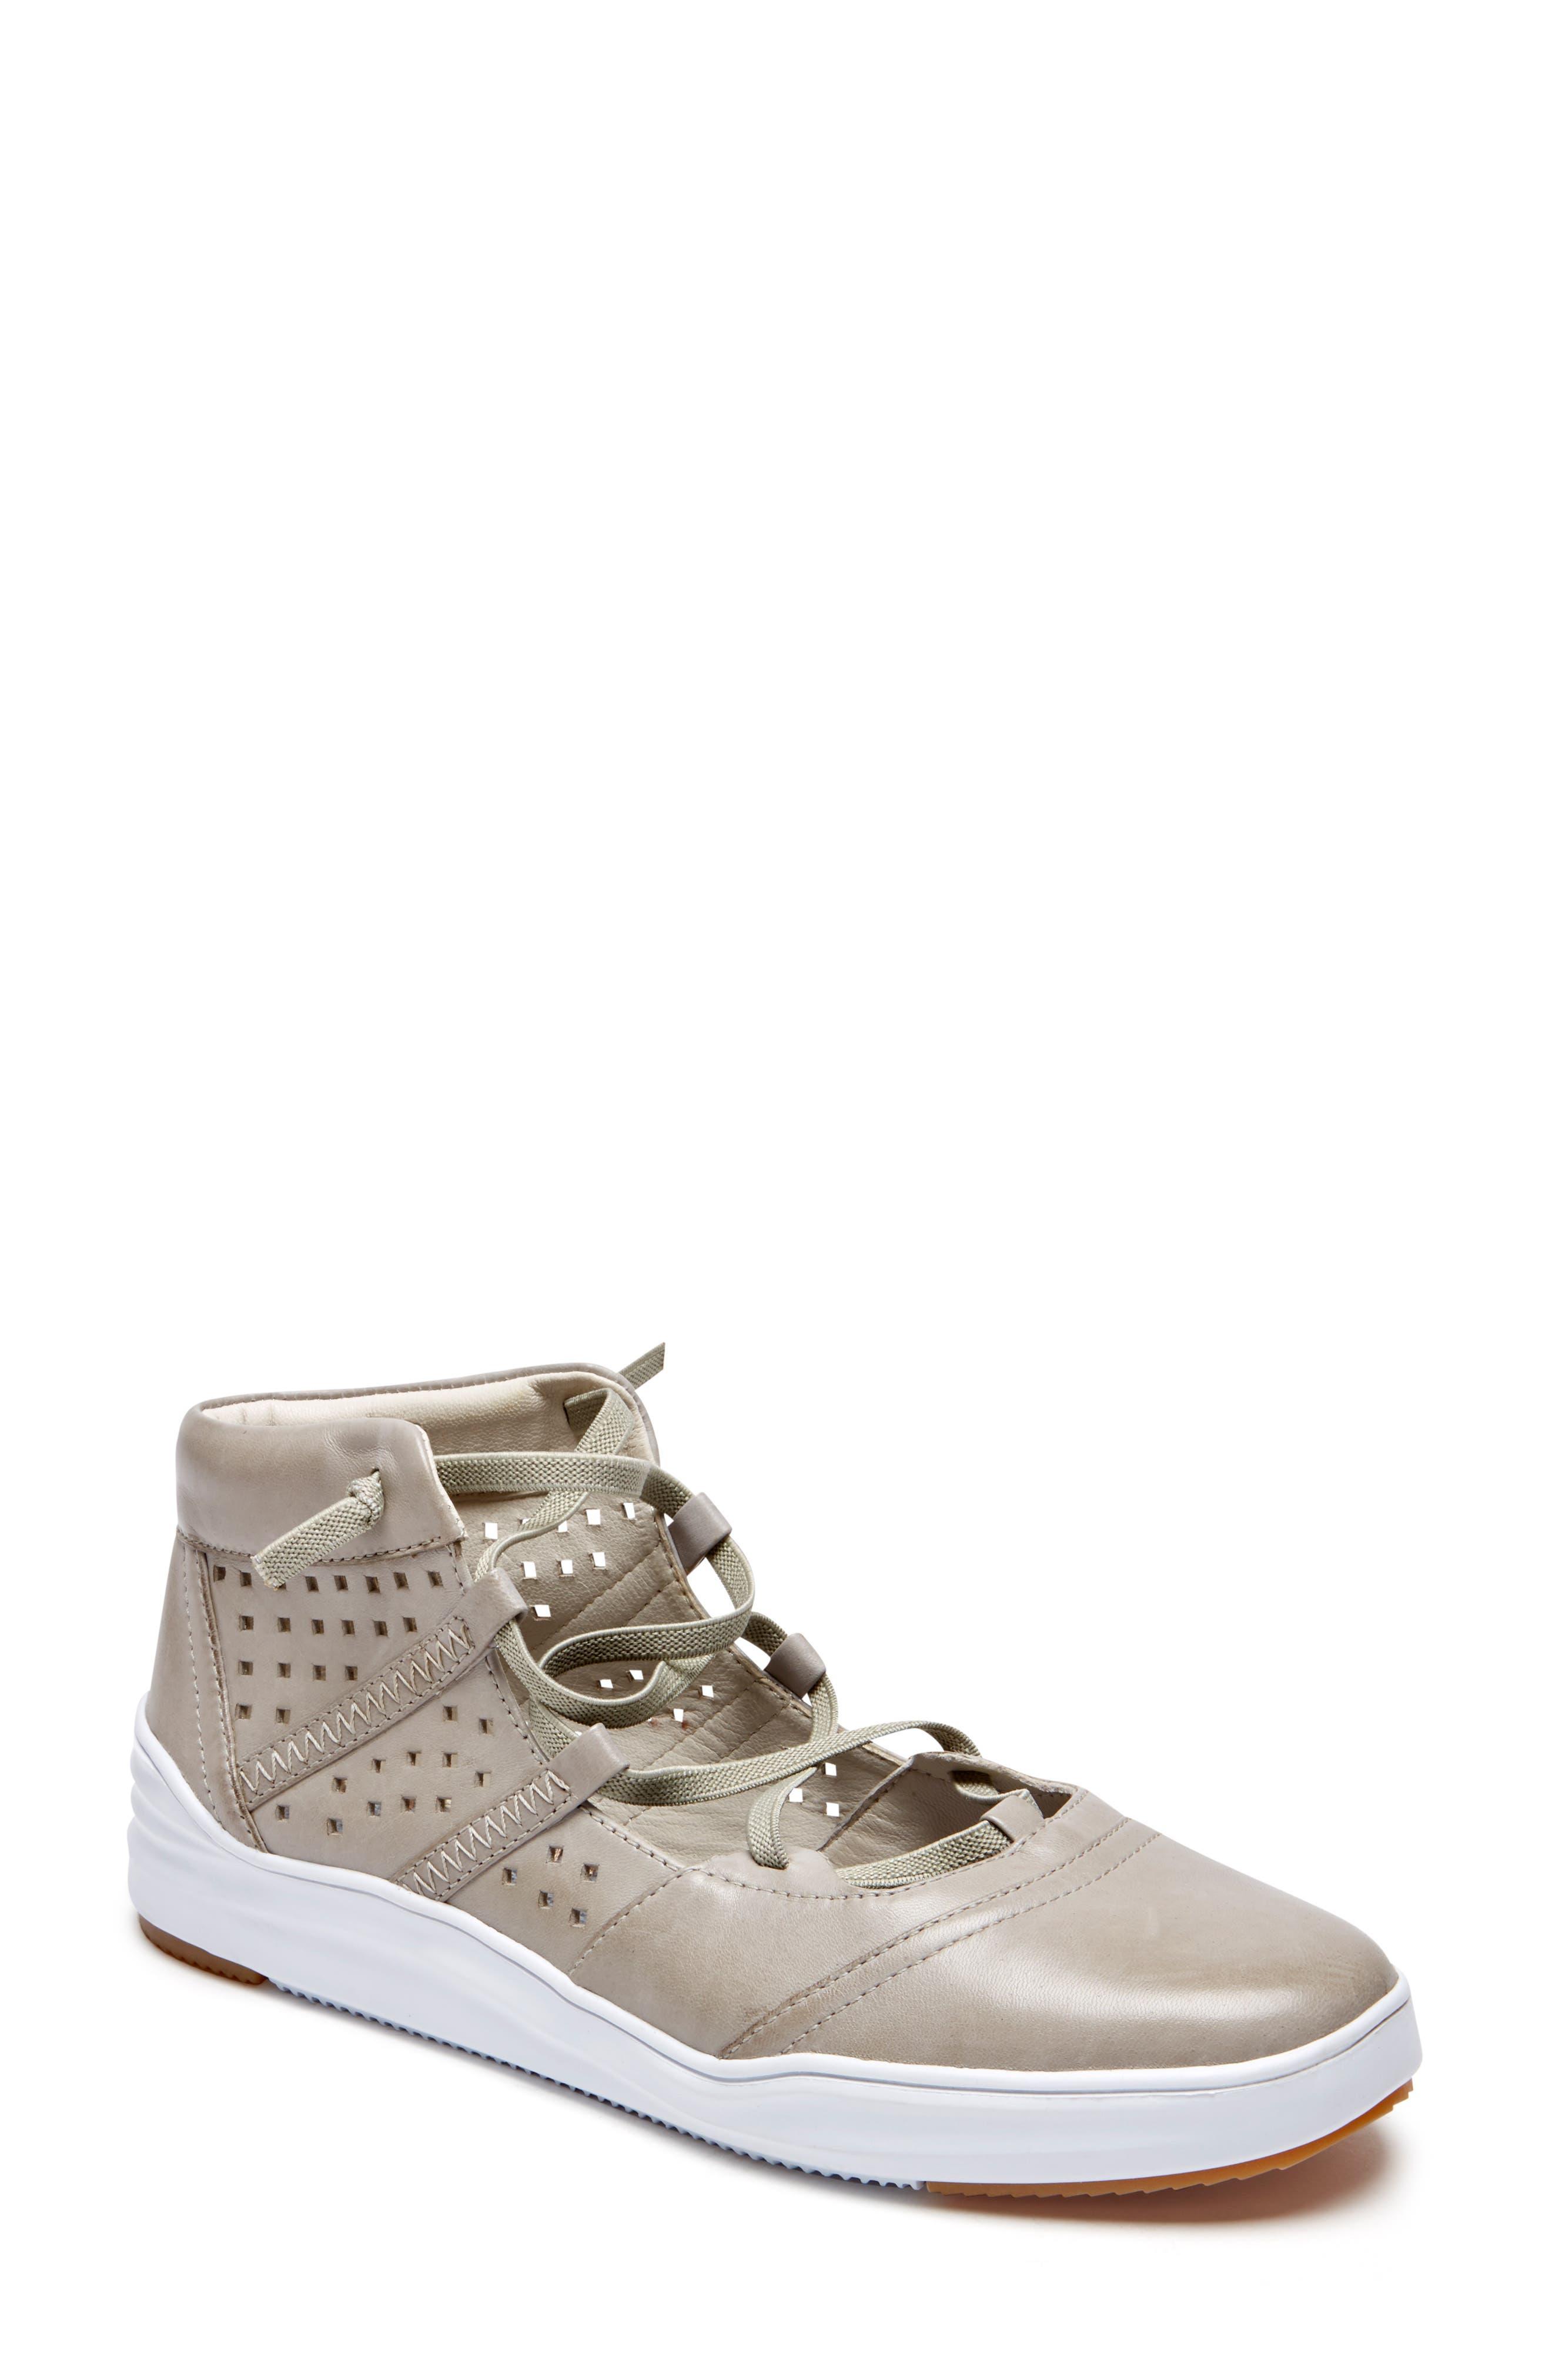 Rockport Cobb Hill Cady Gladiator Sneaker, Grey